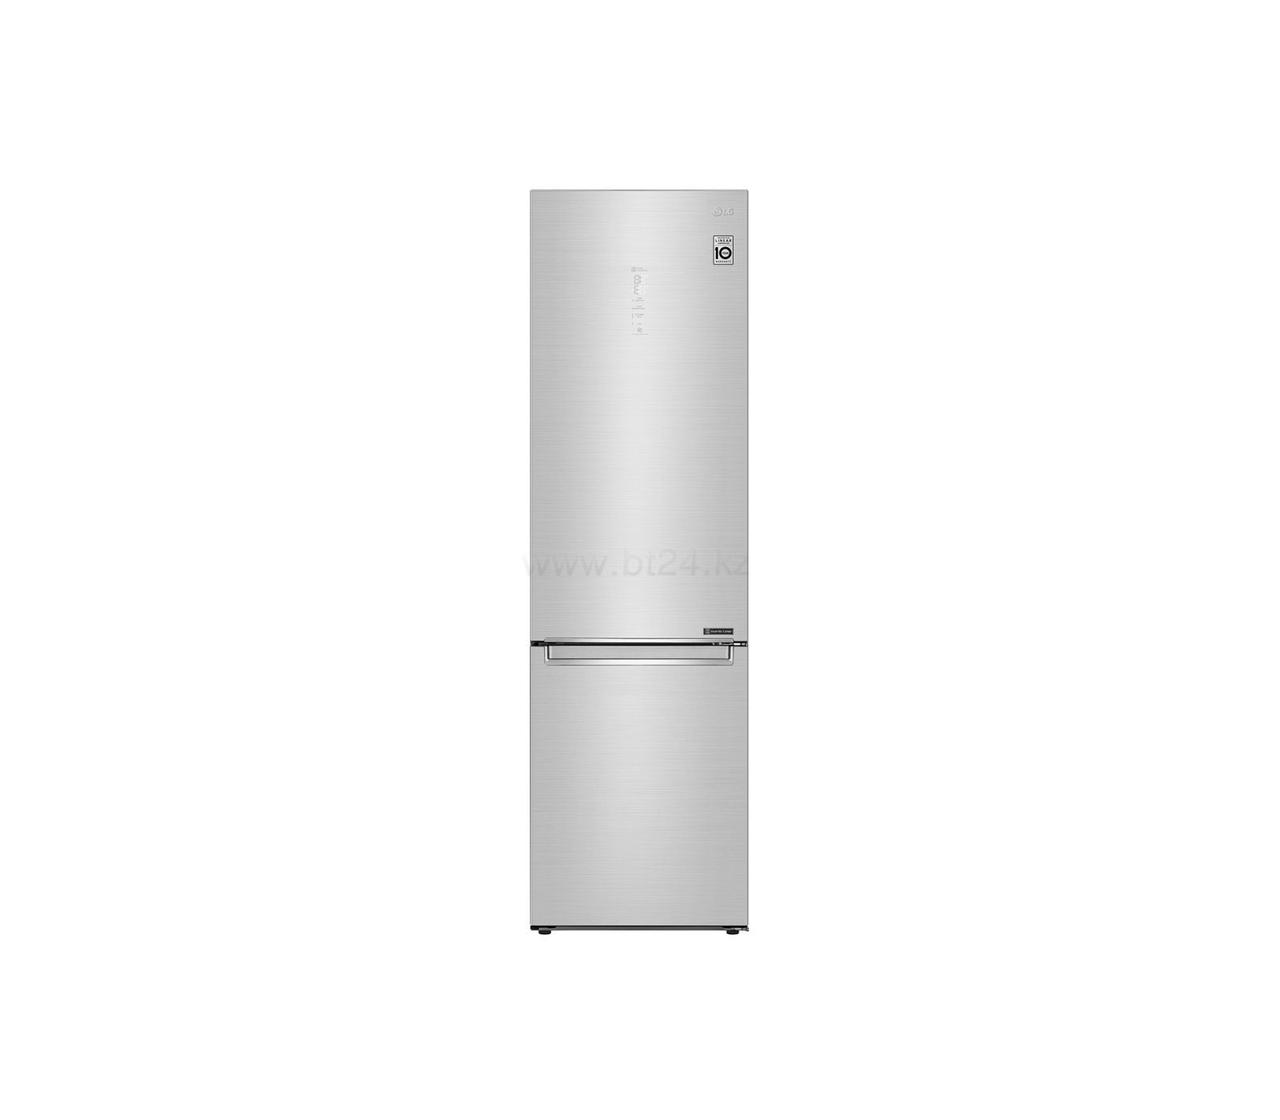 LG GA-B509PSAZ / холодильник No Frost